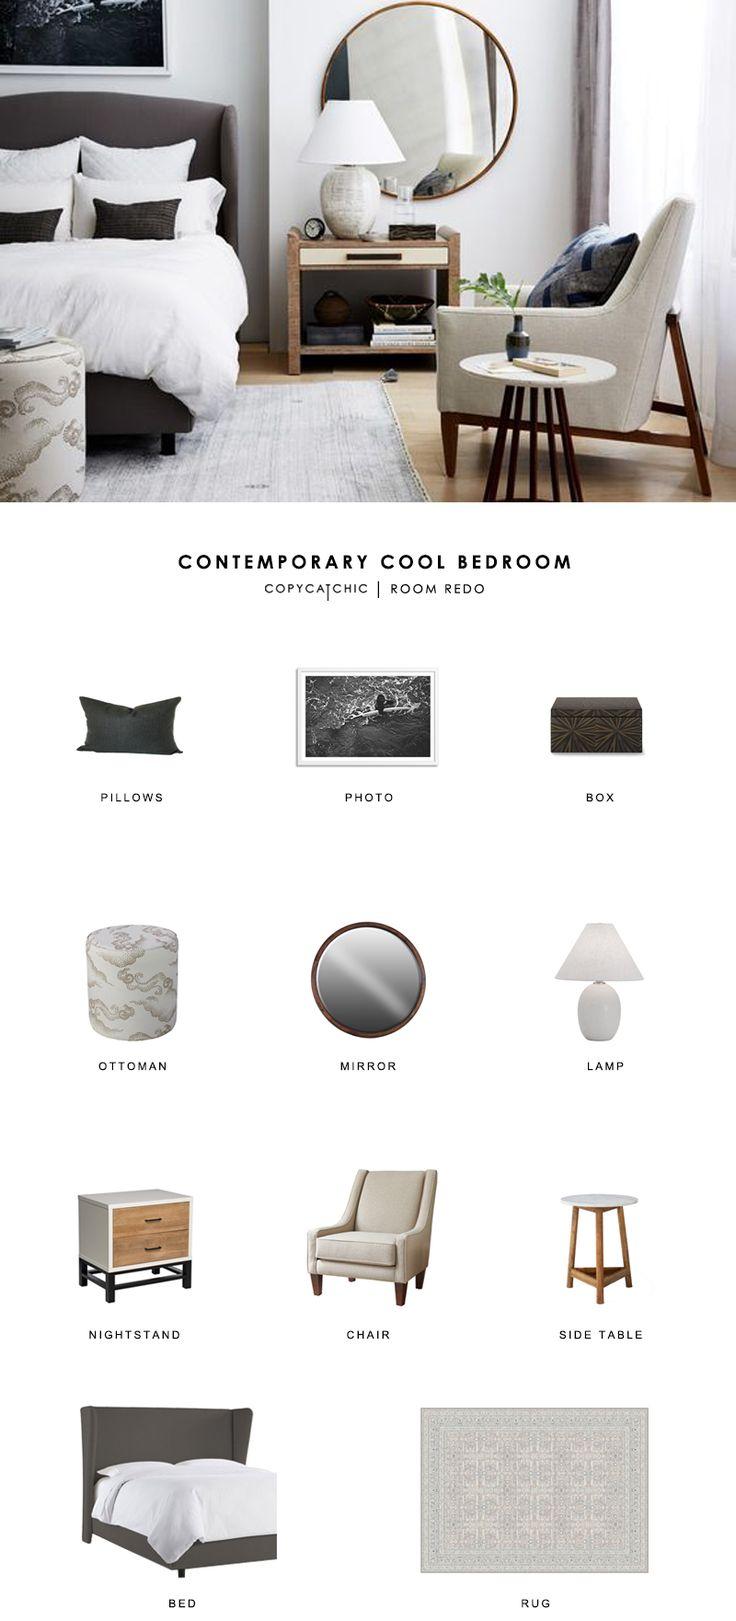 Copy Cat Chic Room Redo | Contemporary Cool Bedroom | Copy Cat Chic | Bloglovin'